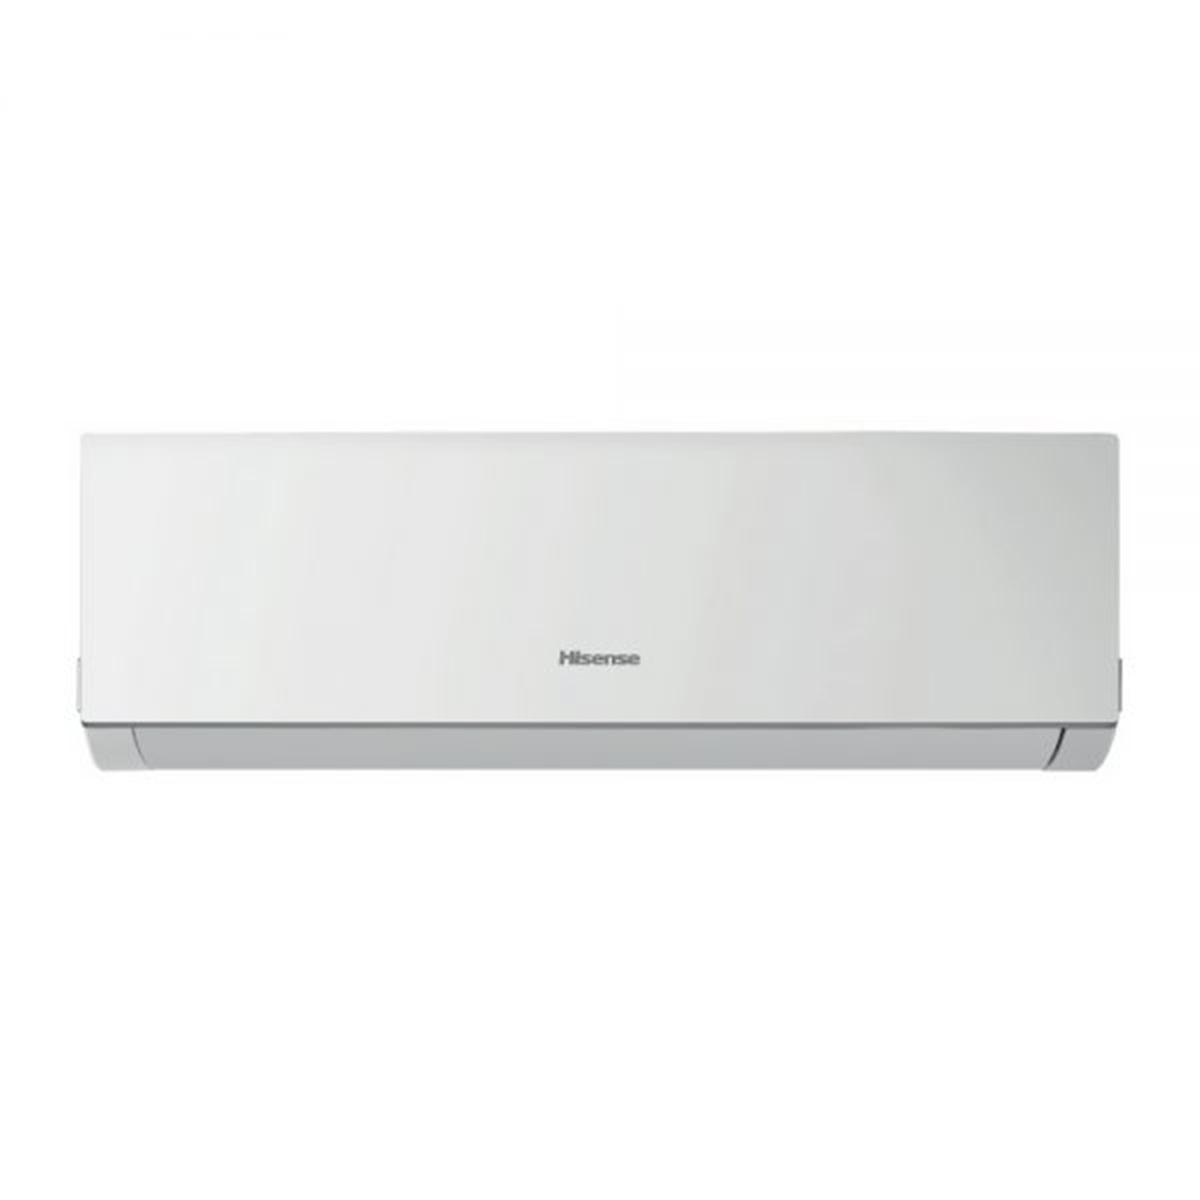 Aparat de aer conditionat tip split Hisense New Comfort, Inverter, R32, A++, Wifi Ready 28